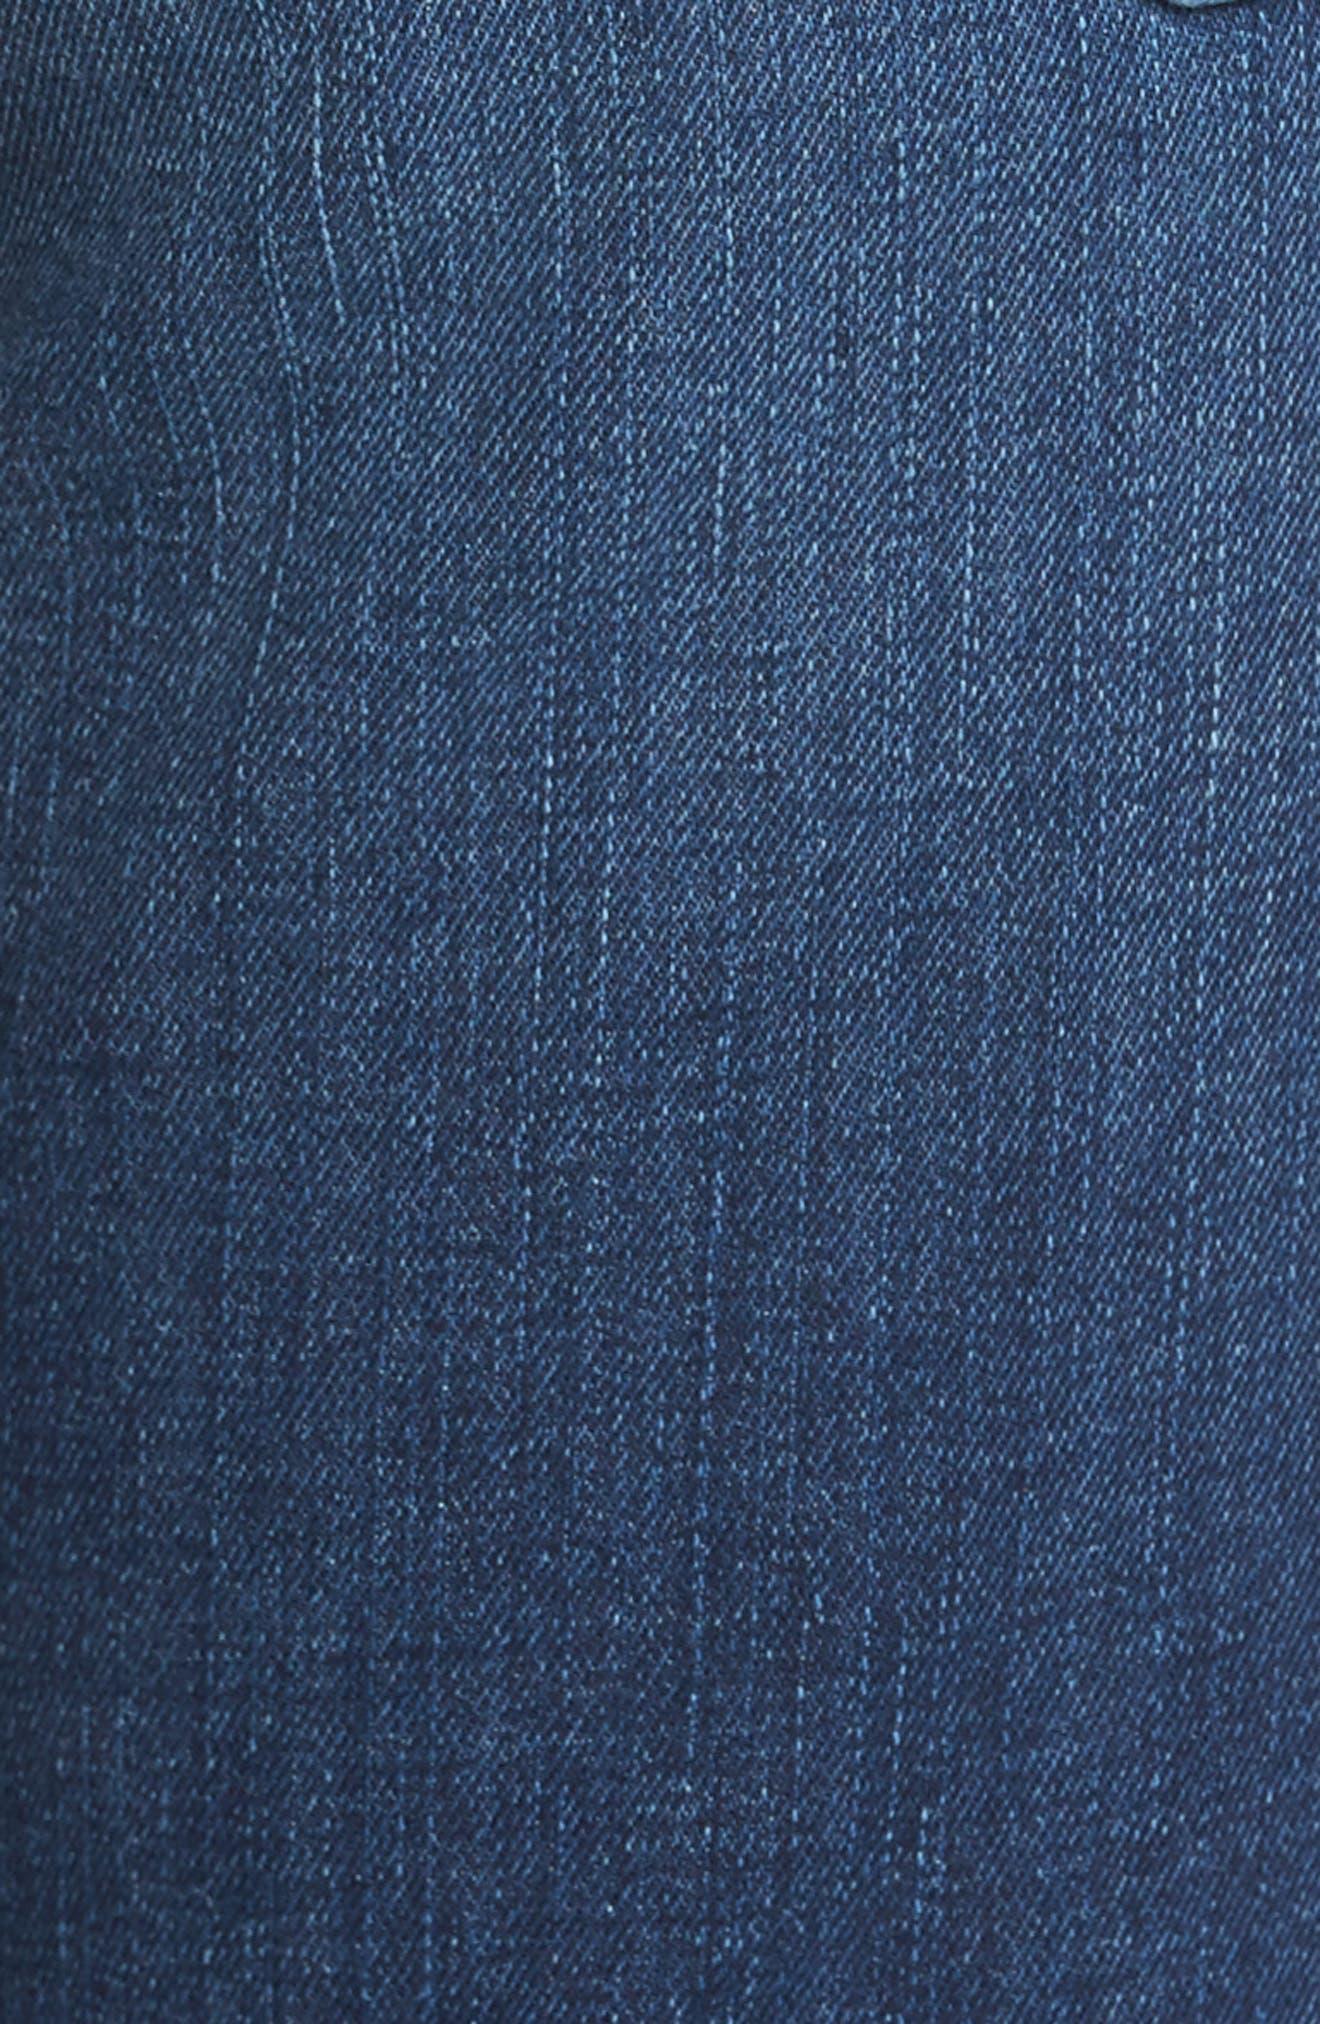 Coco Curvy Straight Leg Jeans,                             Alternate thumbnail 5, color,                             405